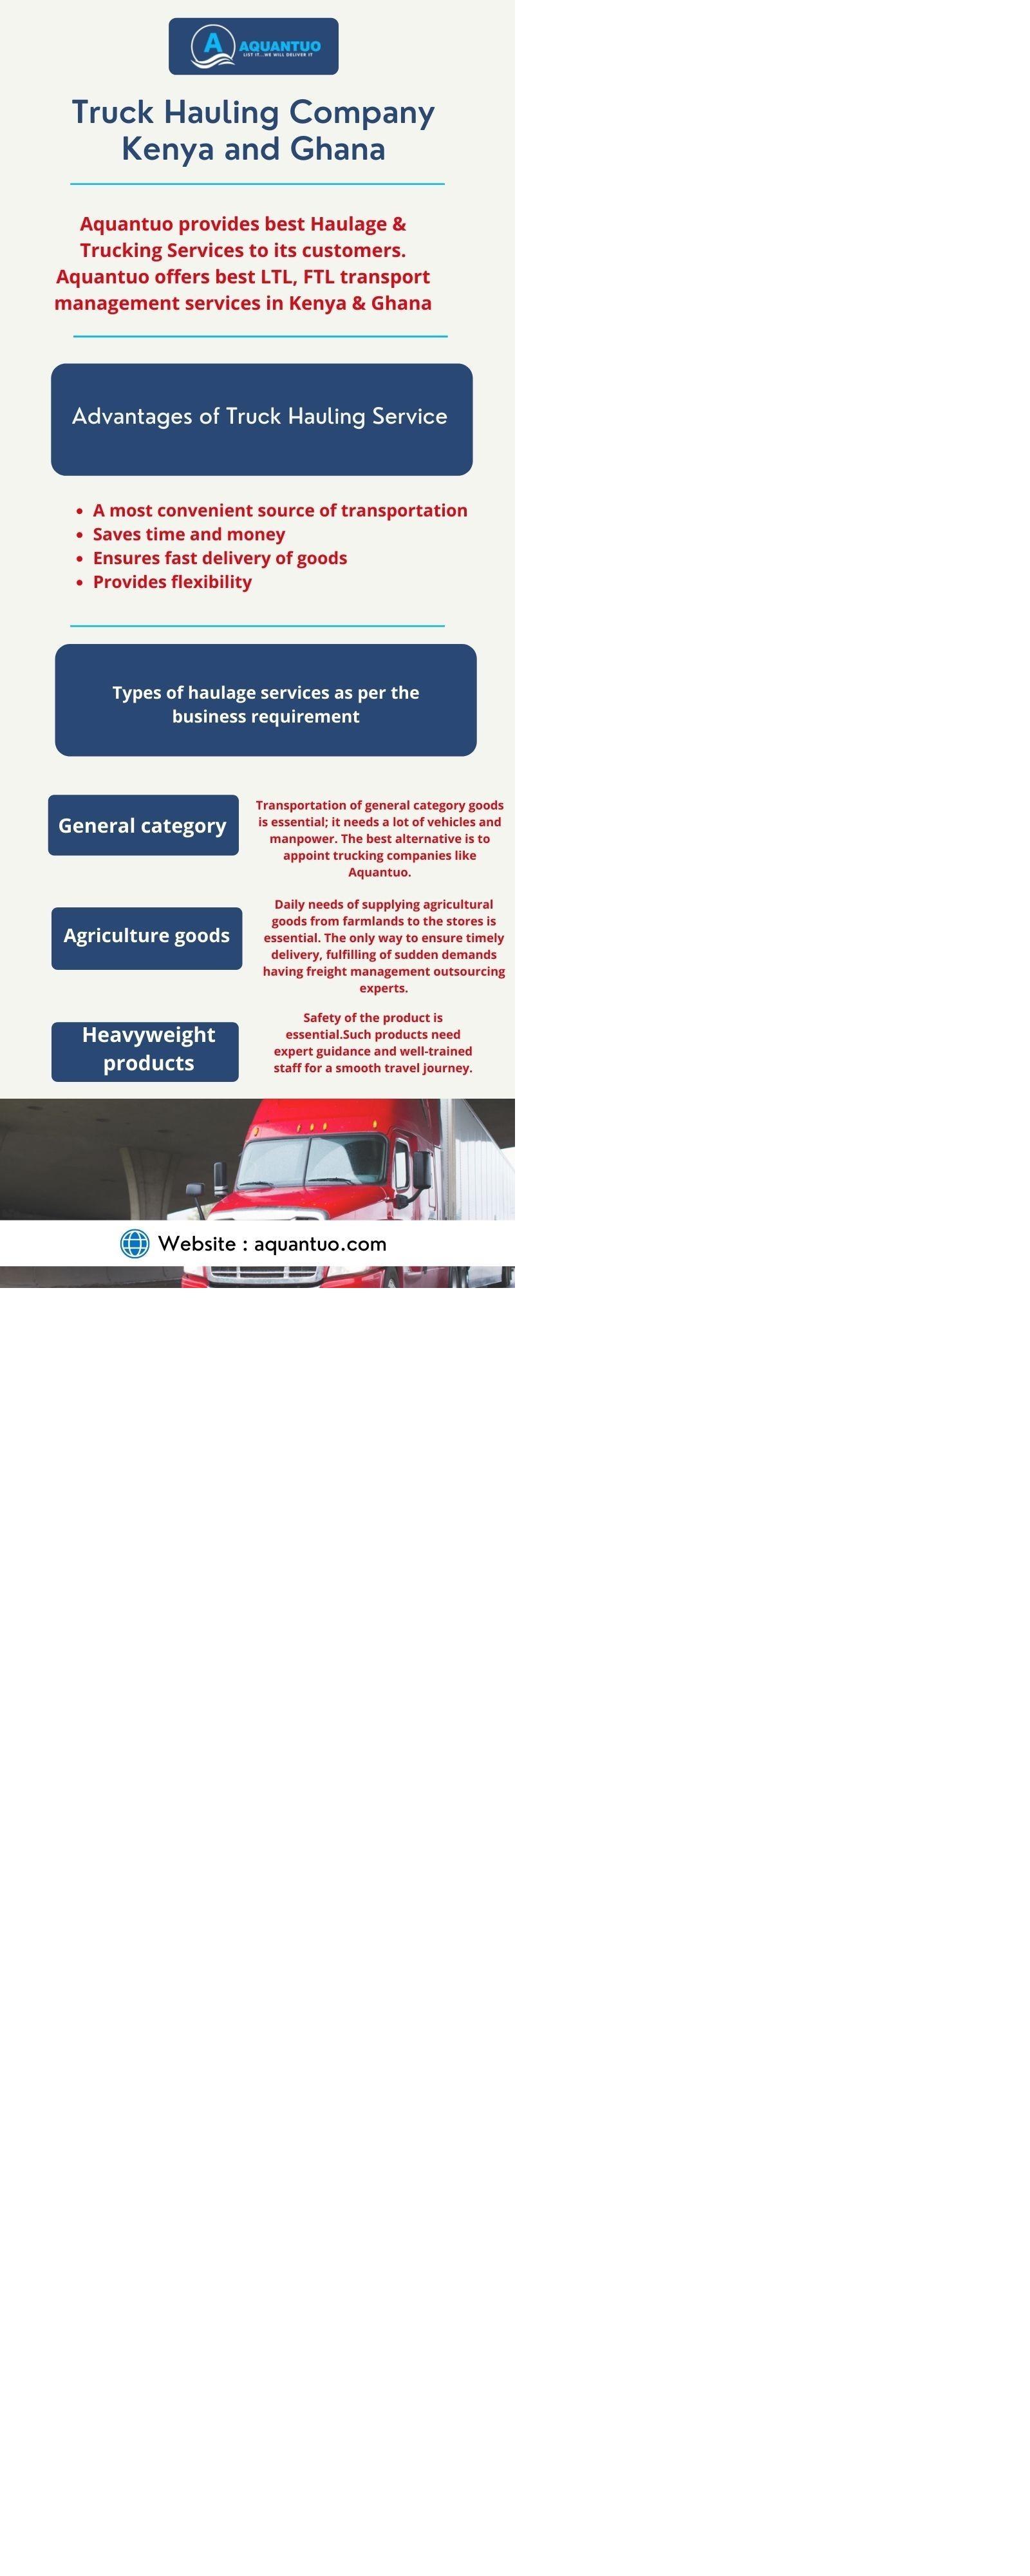 Truck Hauling Company Kenya & Ghana